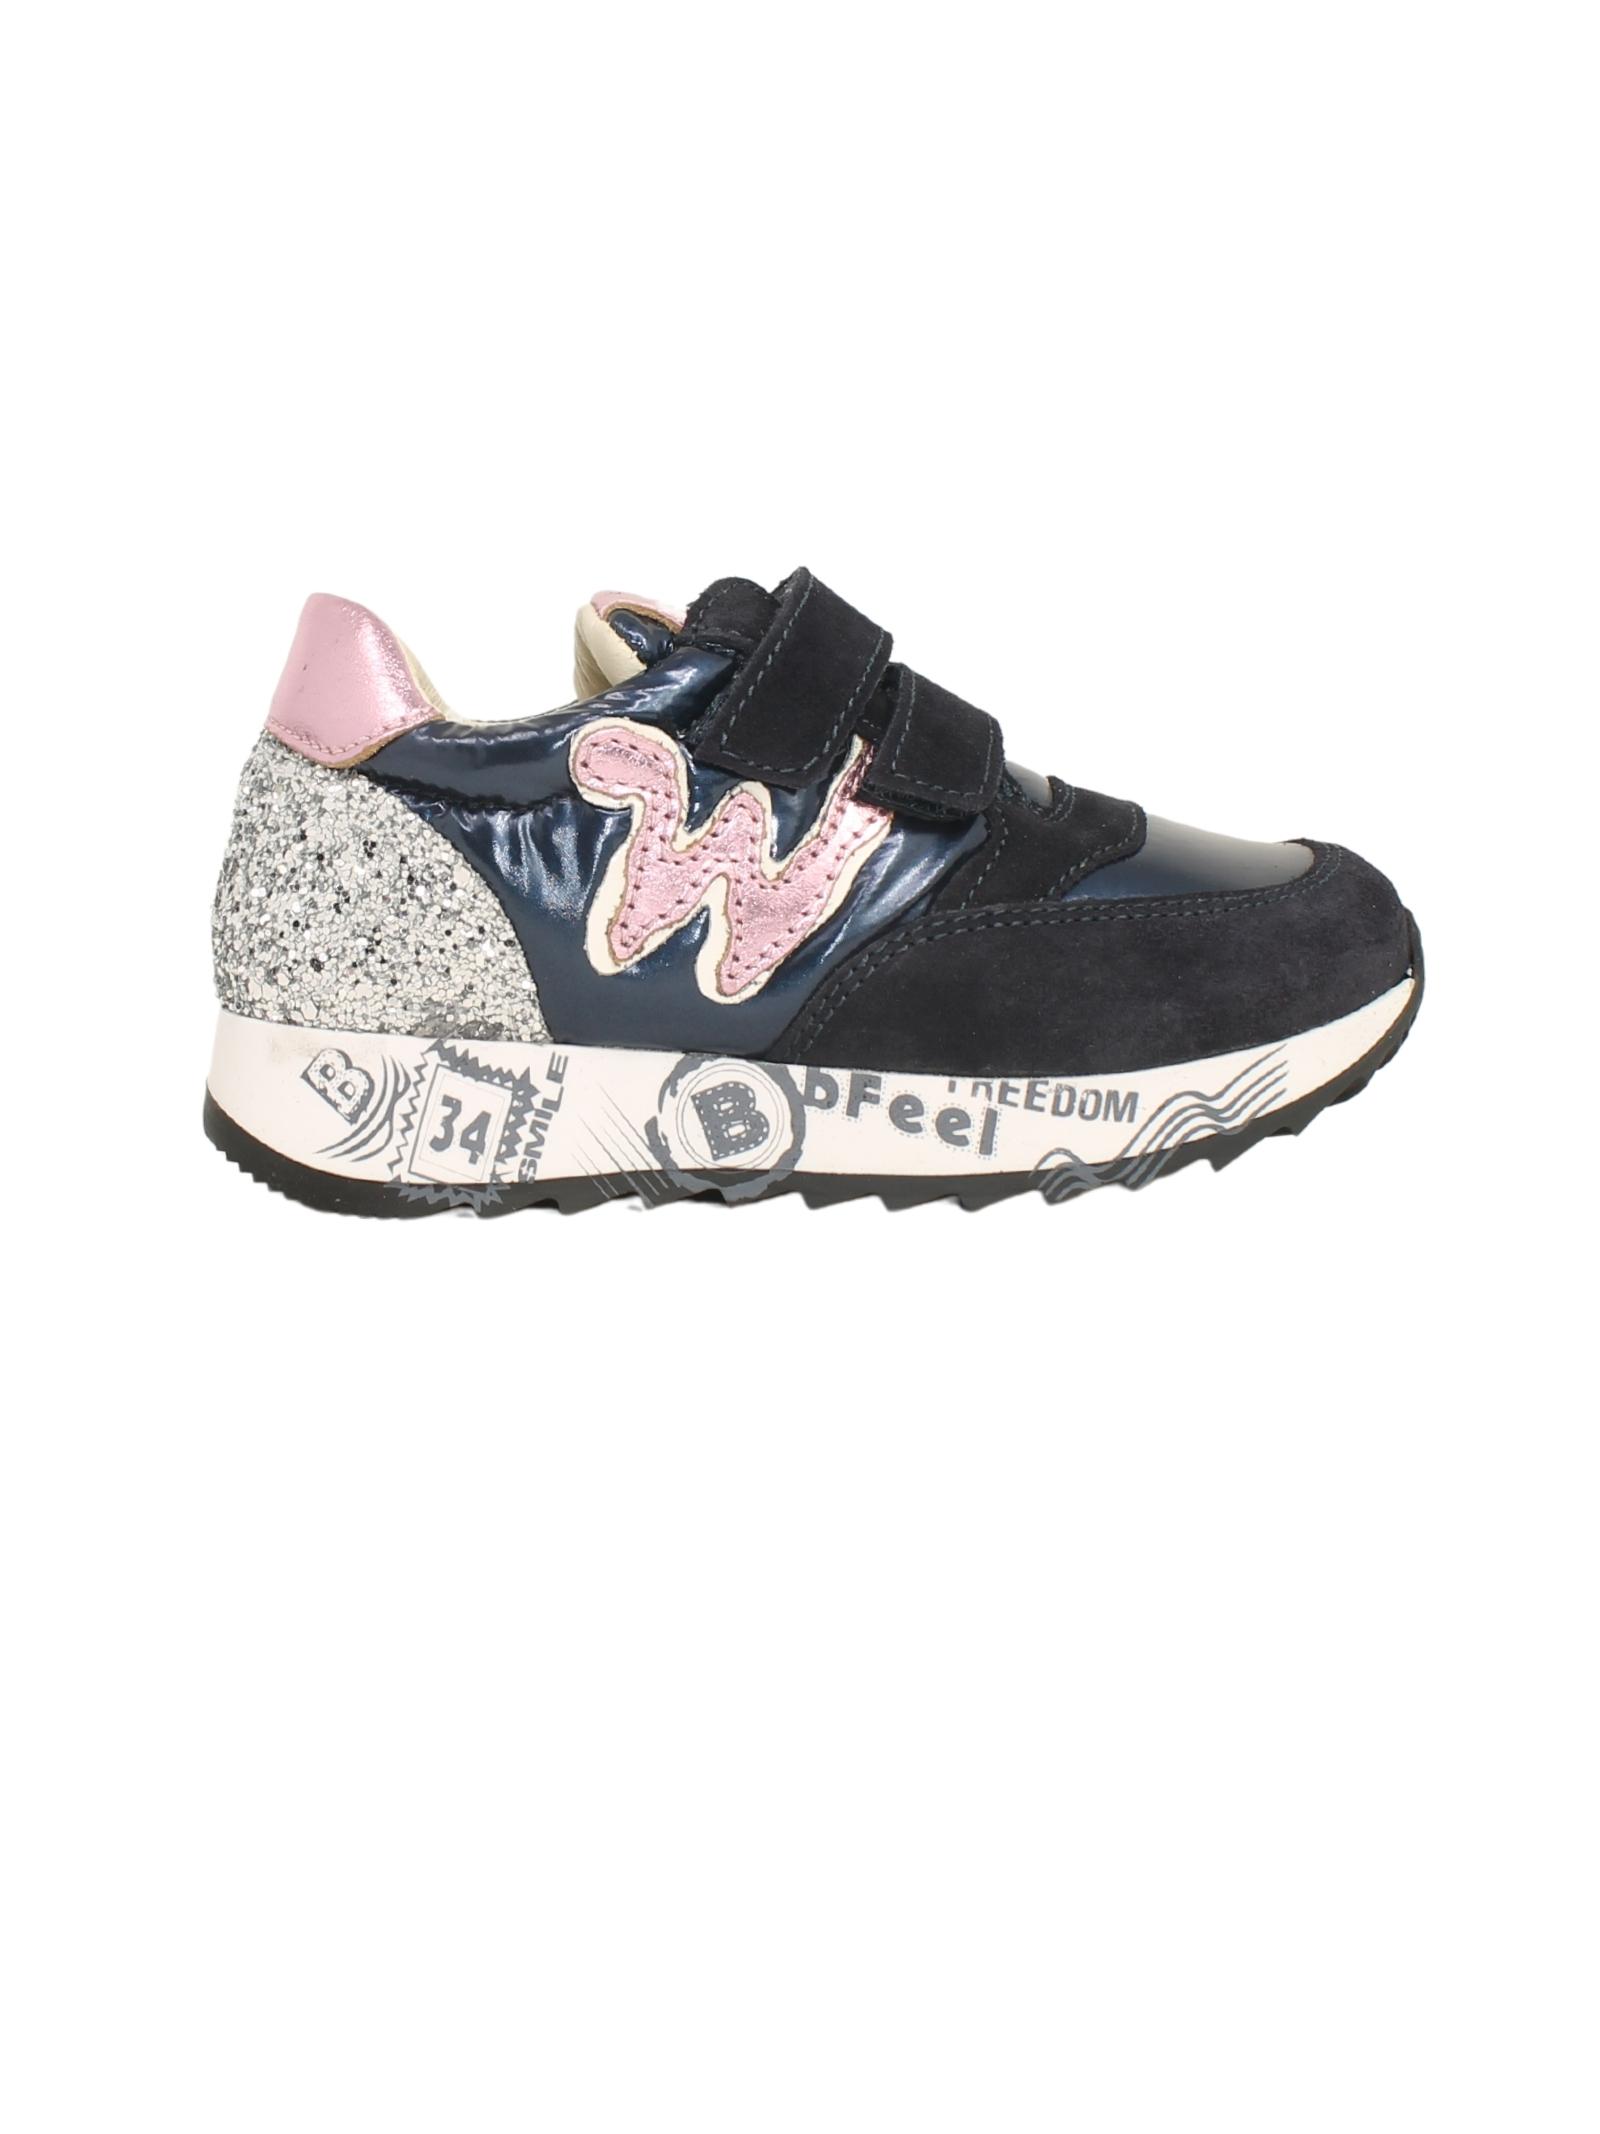 Freedom Sneakers for Girls BALDUCCI | Sneakers | JARN1830CBLU